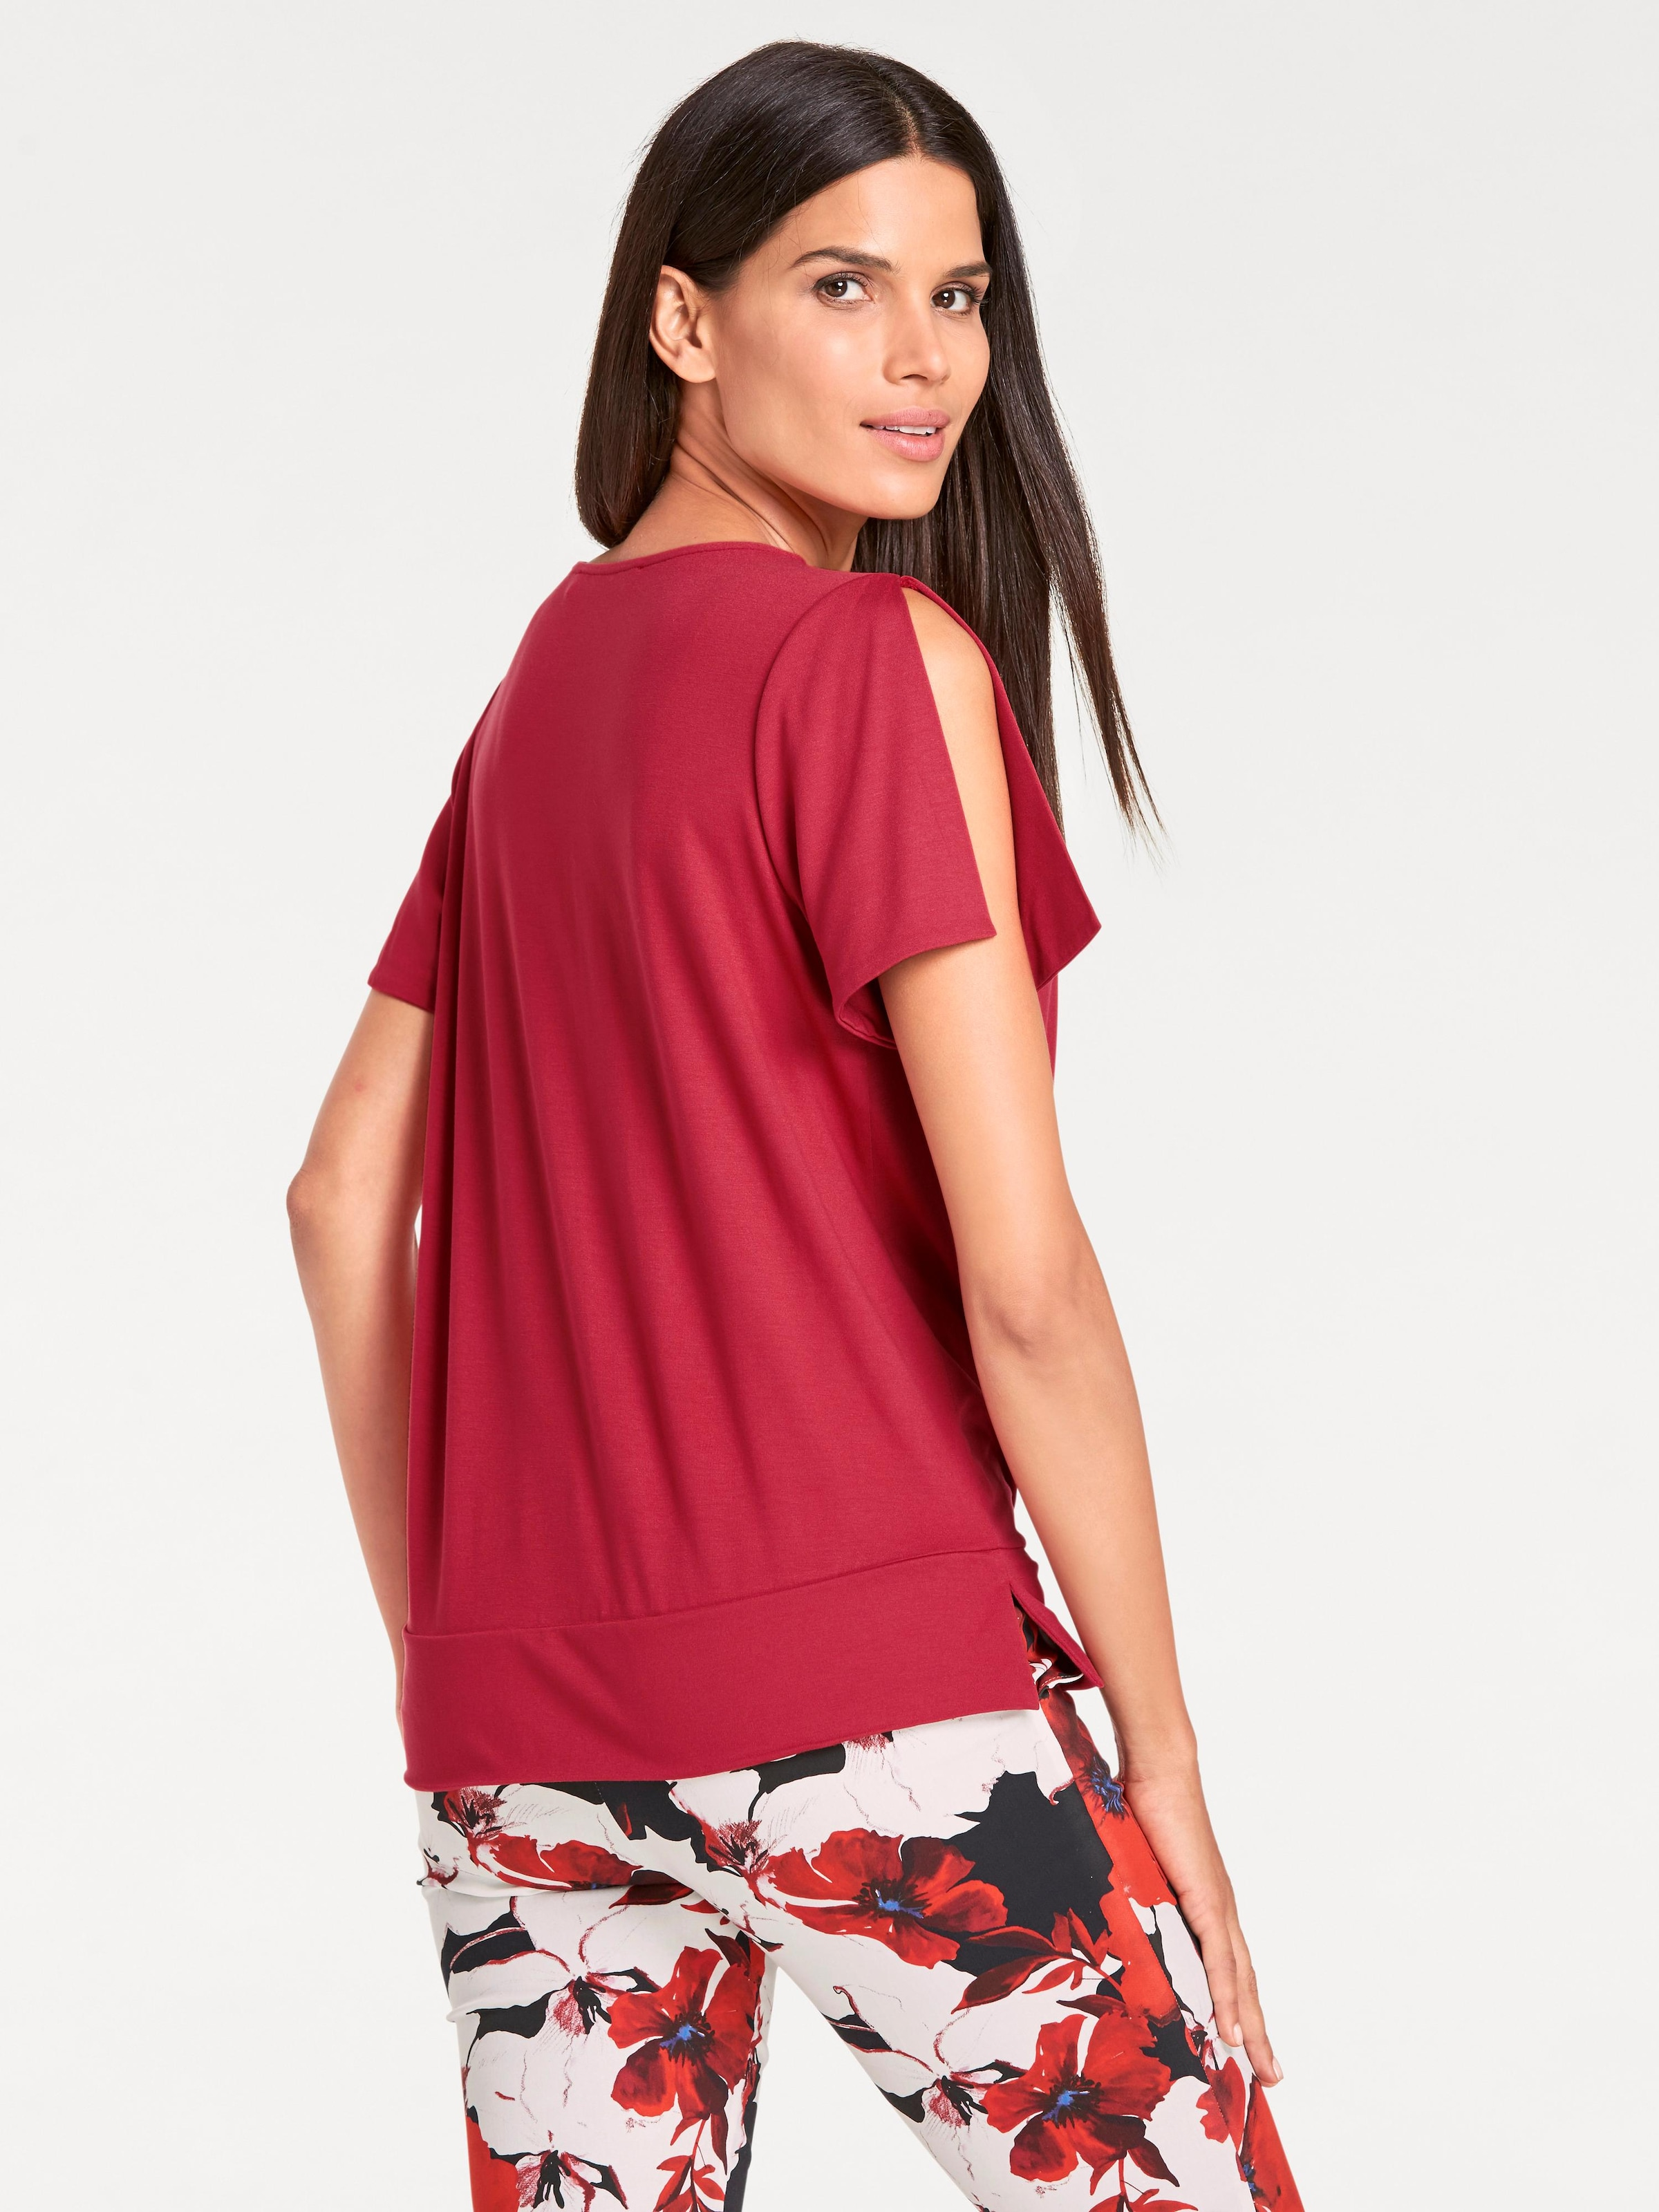 Shirt Ashley mit Brooke Schmuckapplikation by Brooke Shirt heine Ashley mit Ashley Schmuckapplikation by heine w6xp7qP